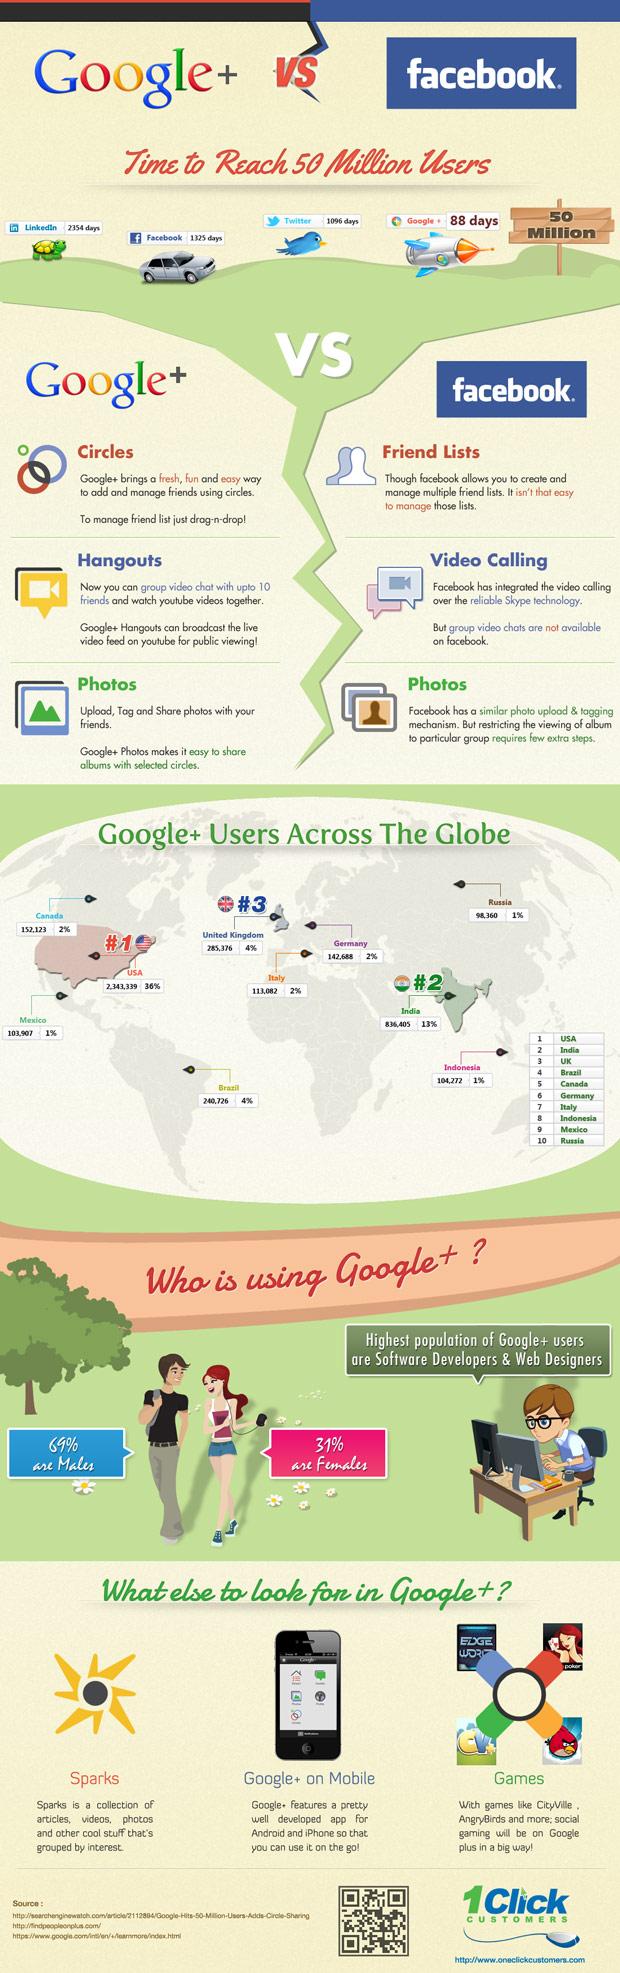 Google+ vs Facebook Infographic